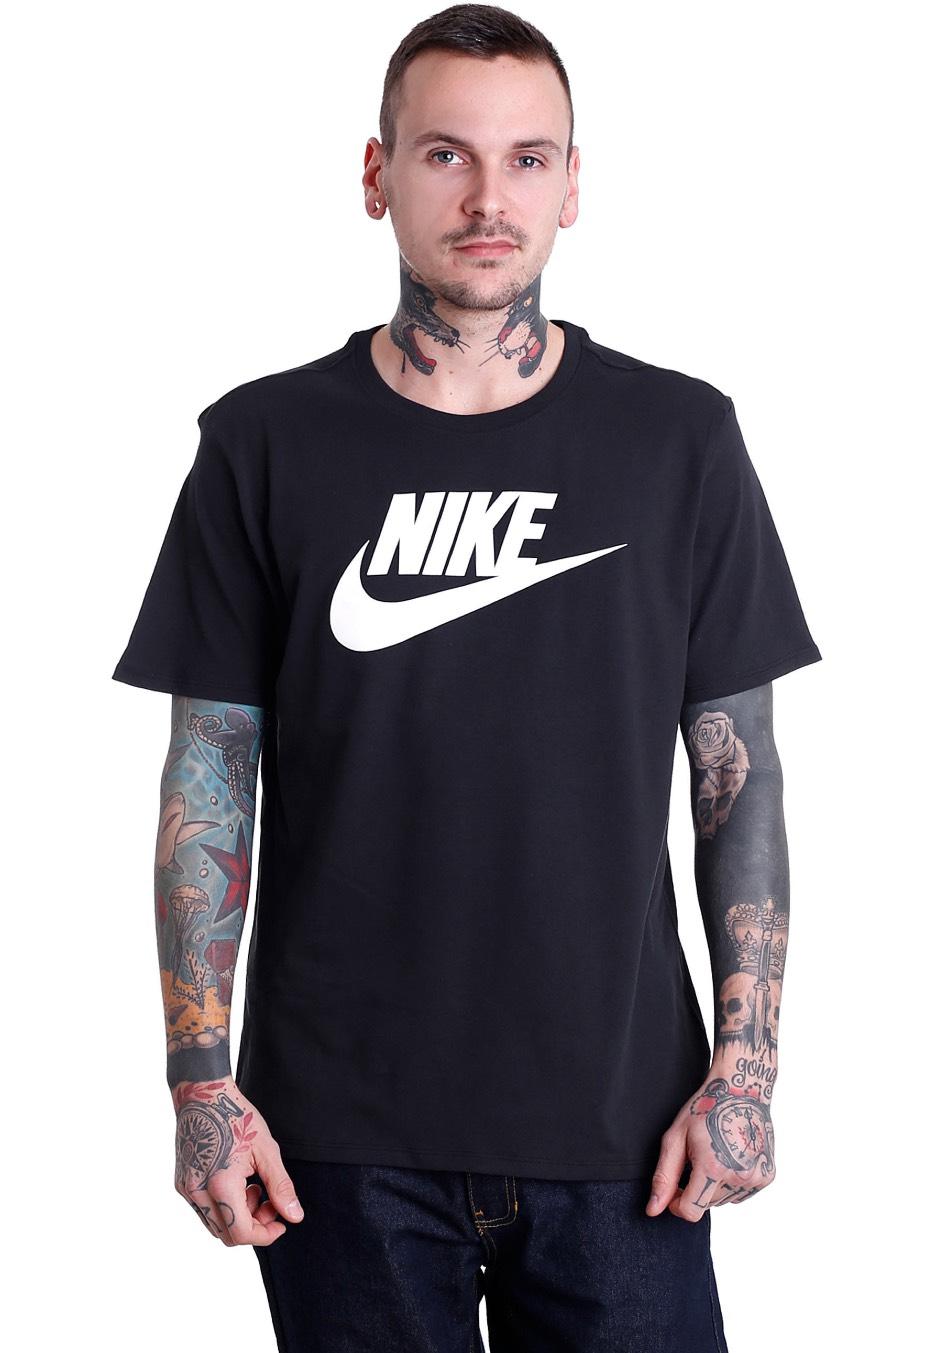 a50887b32 Nike - Futura Icon Black/Black/White - T-Shirt - Streetwear Shop -  Impericon.com UK